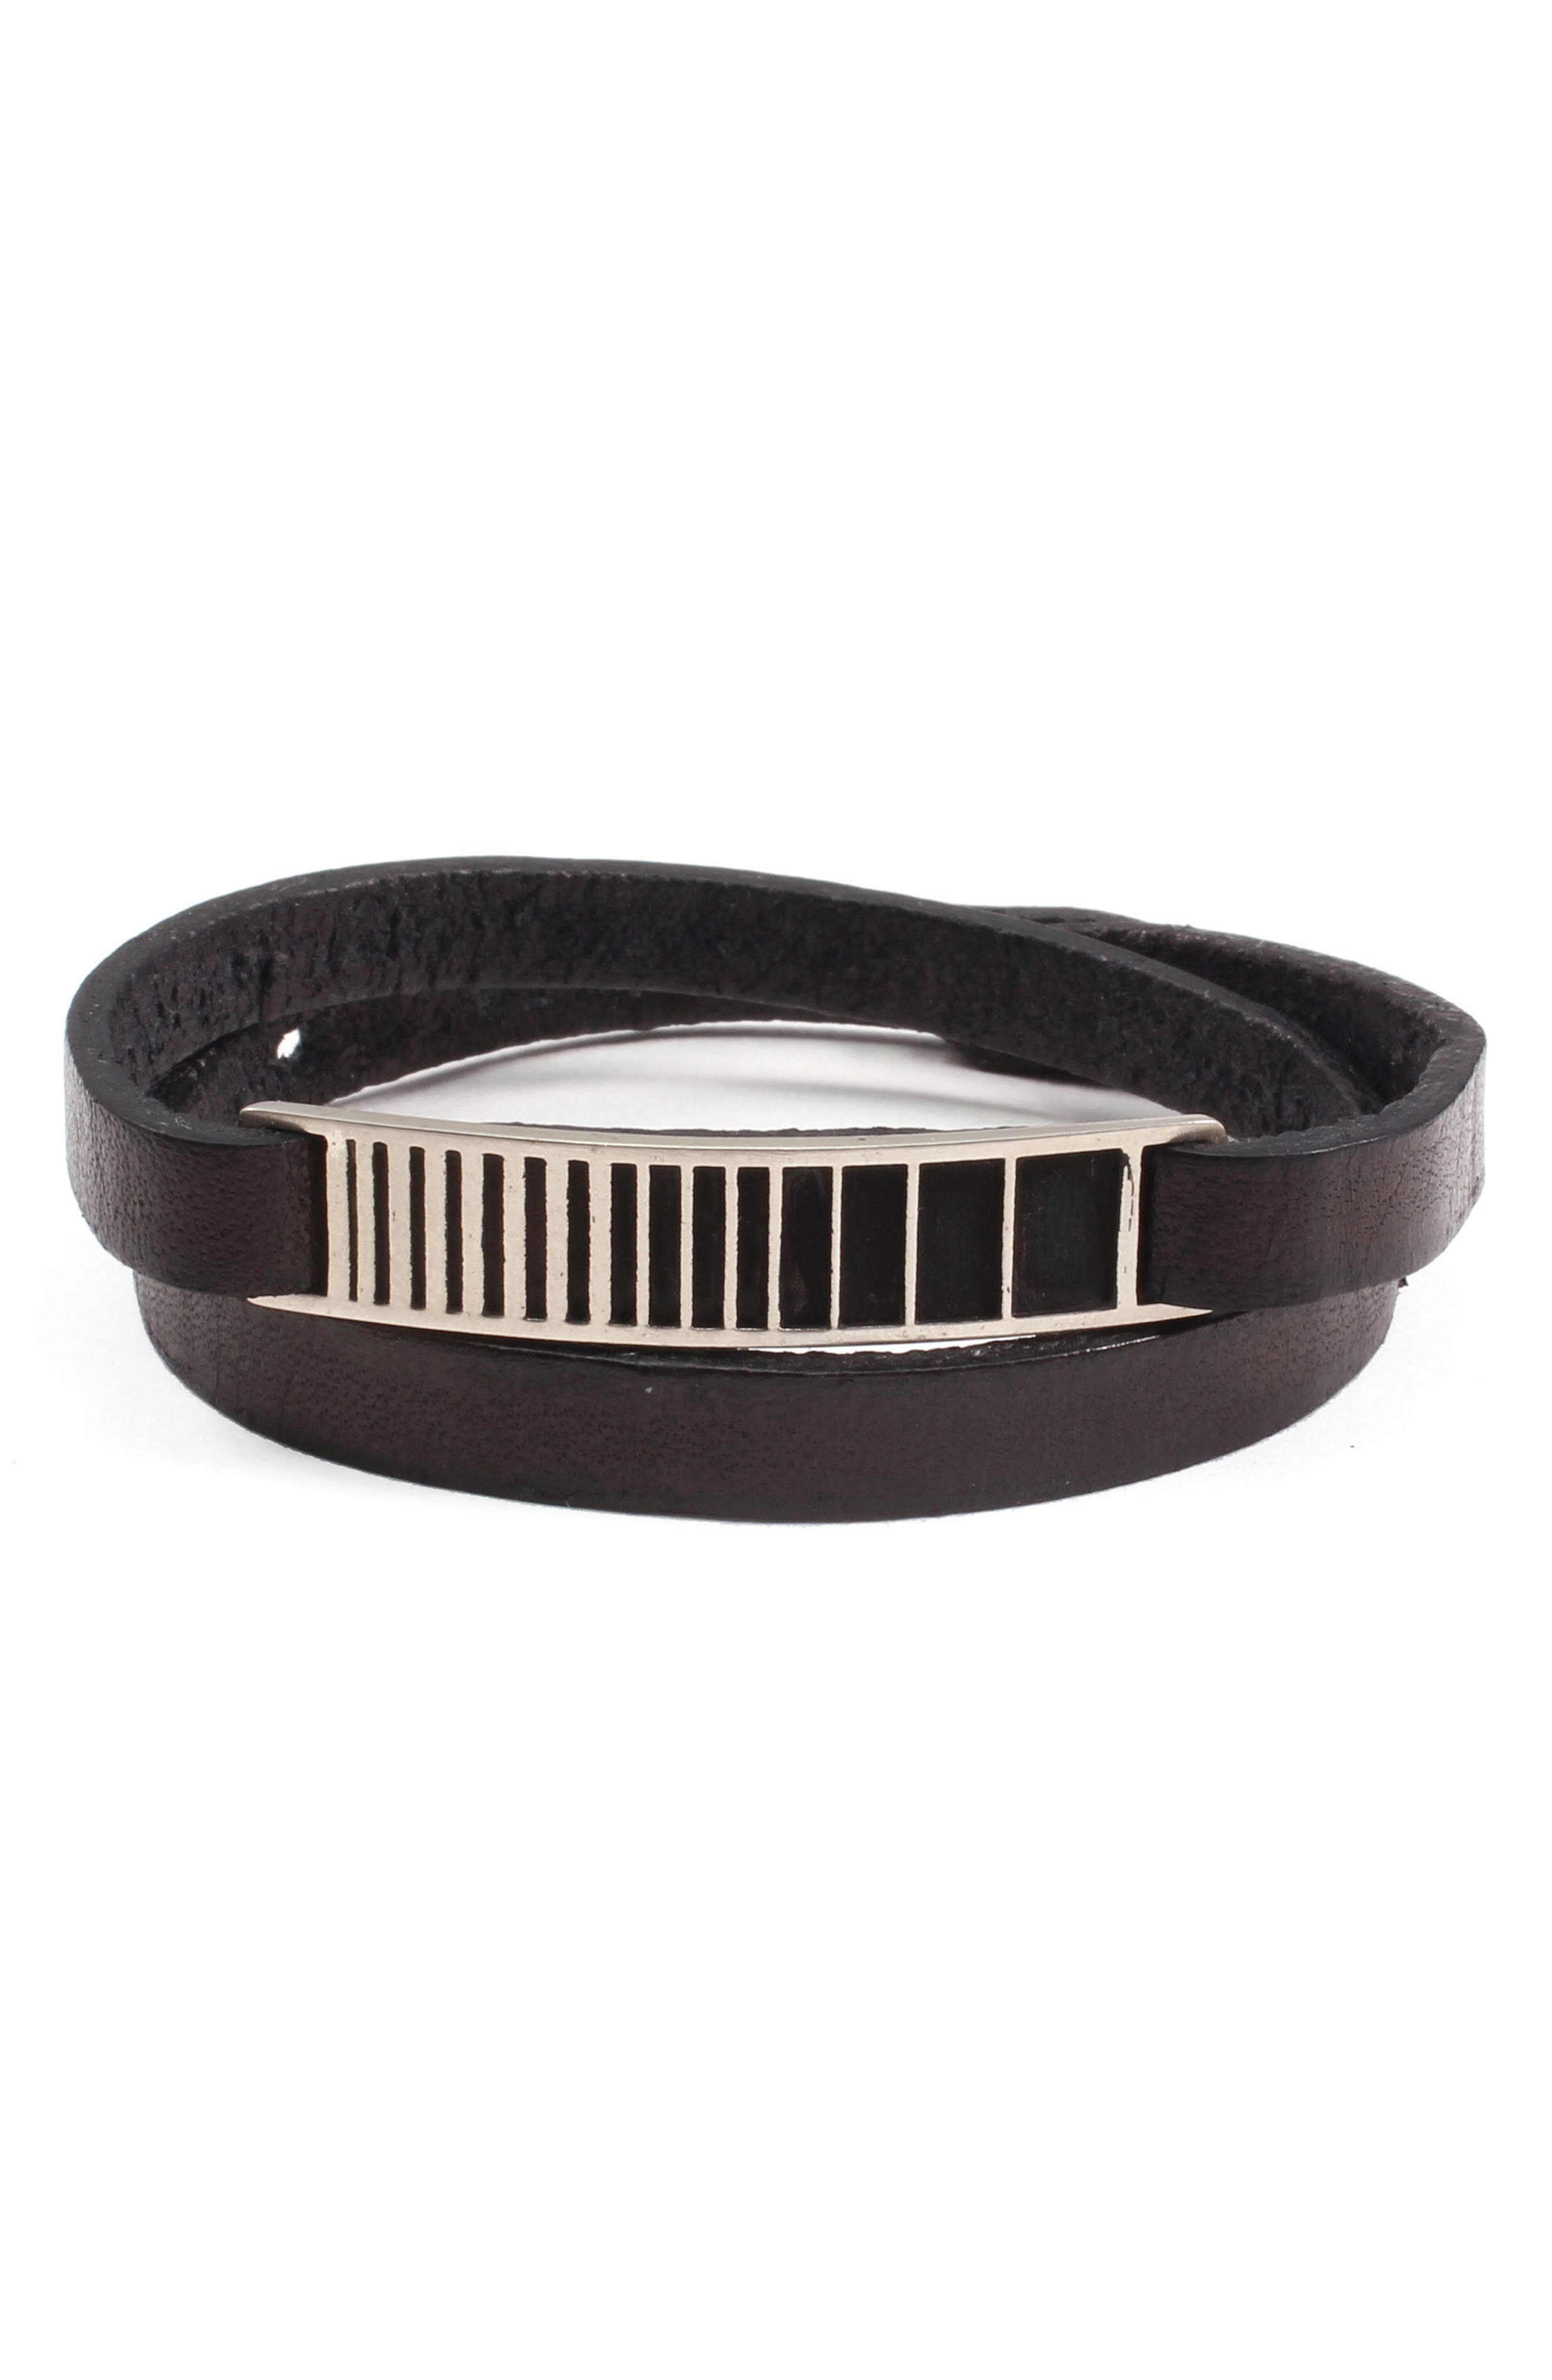 Utopia ID Leather Wrap Bracelet,                             Main thumbnail 1, color,                             001